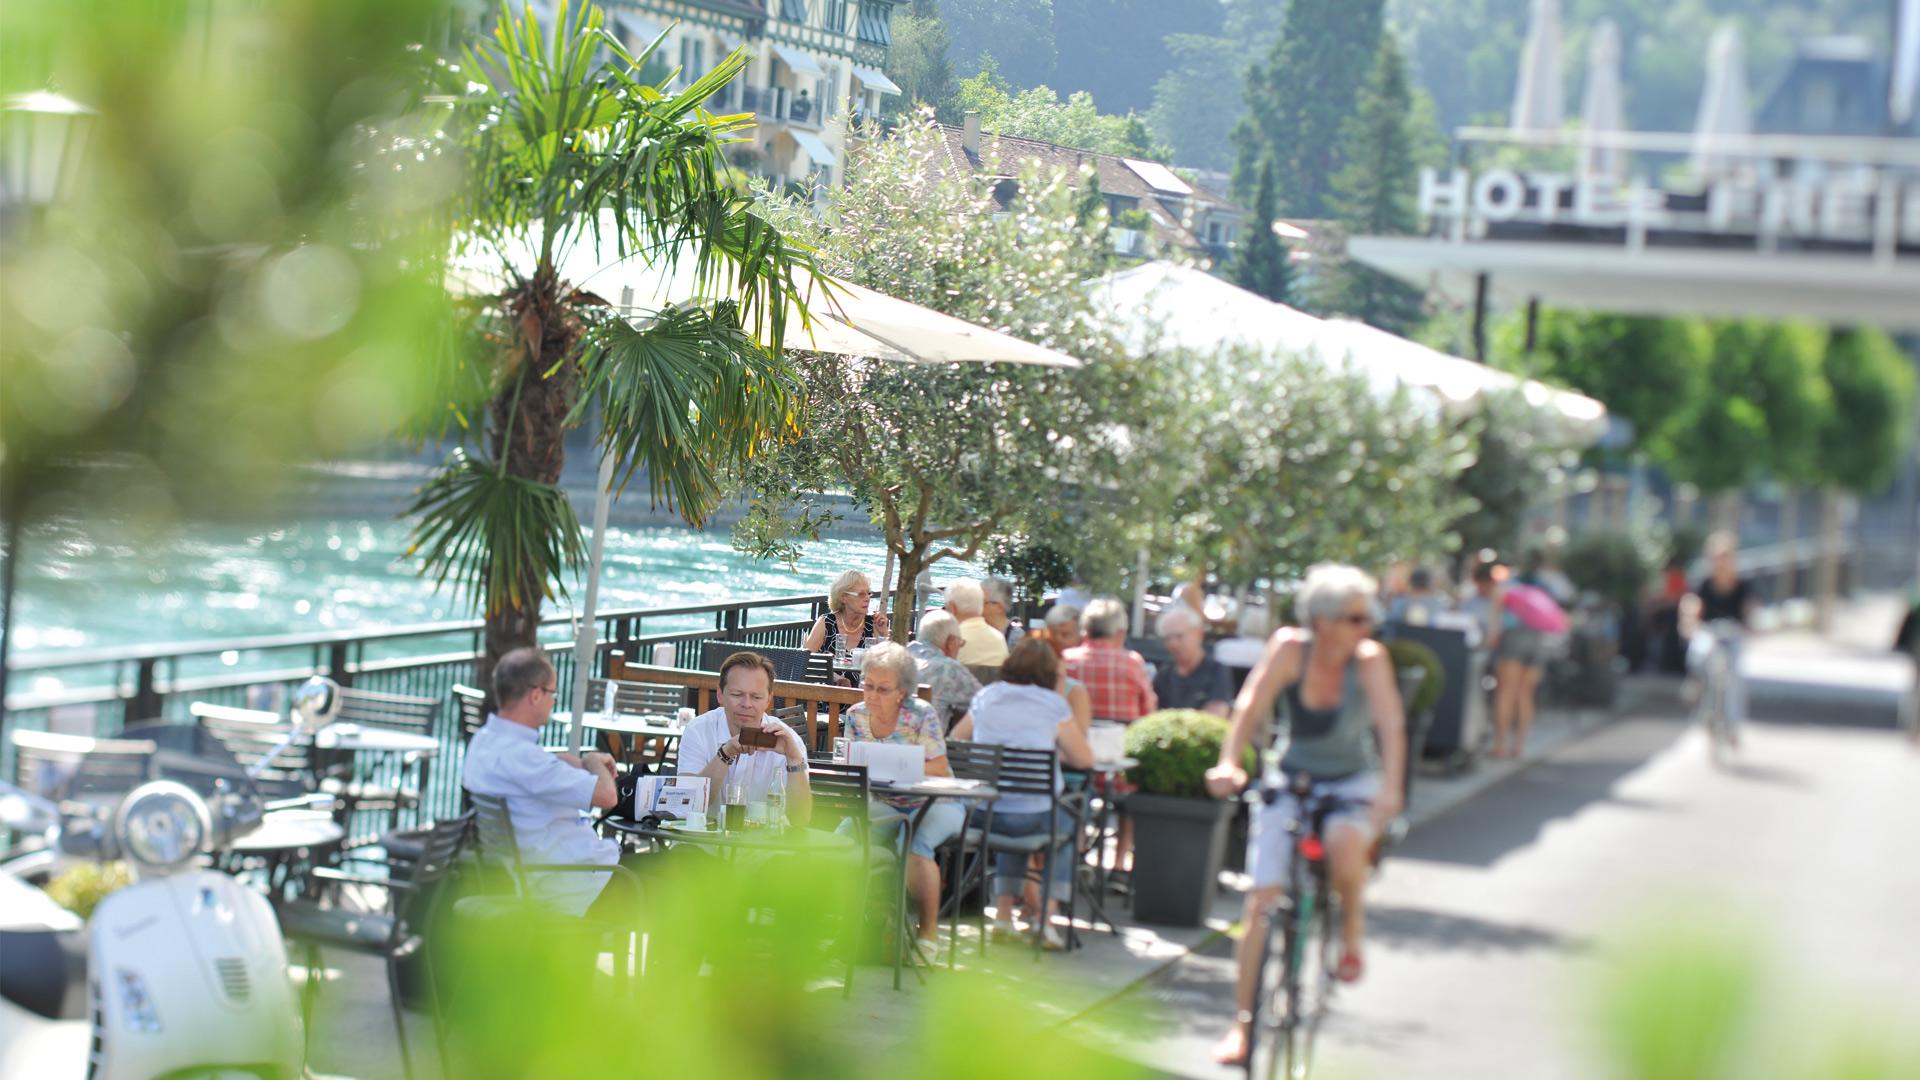 hotel-freienhof-thun-restaurant-terrasse